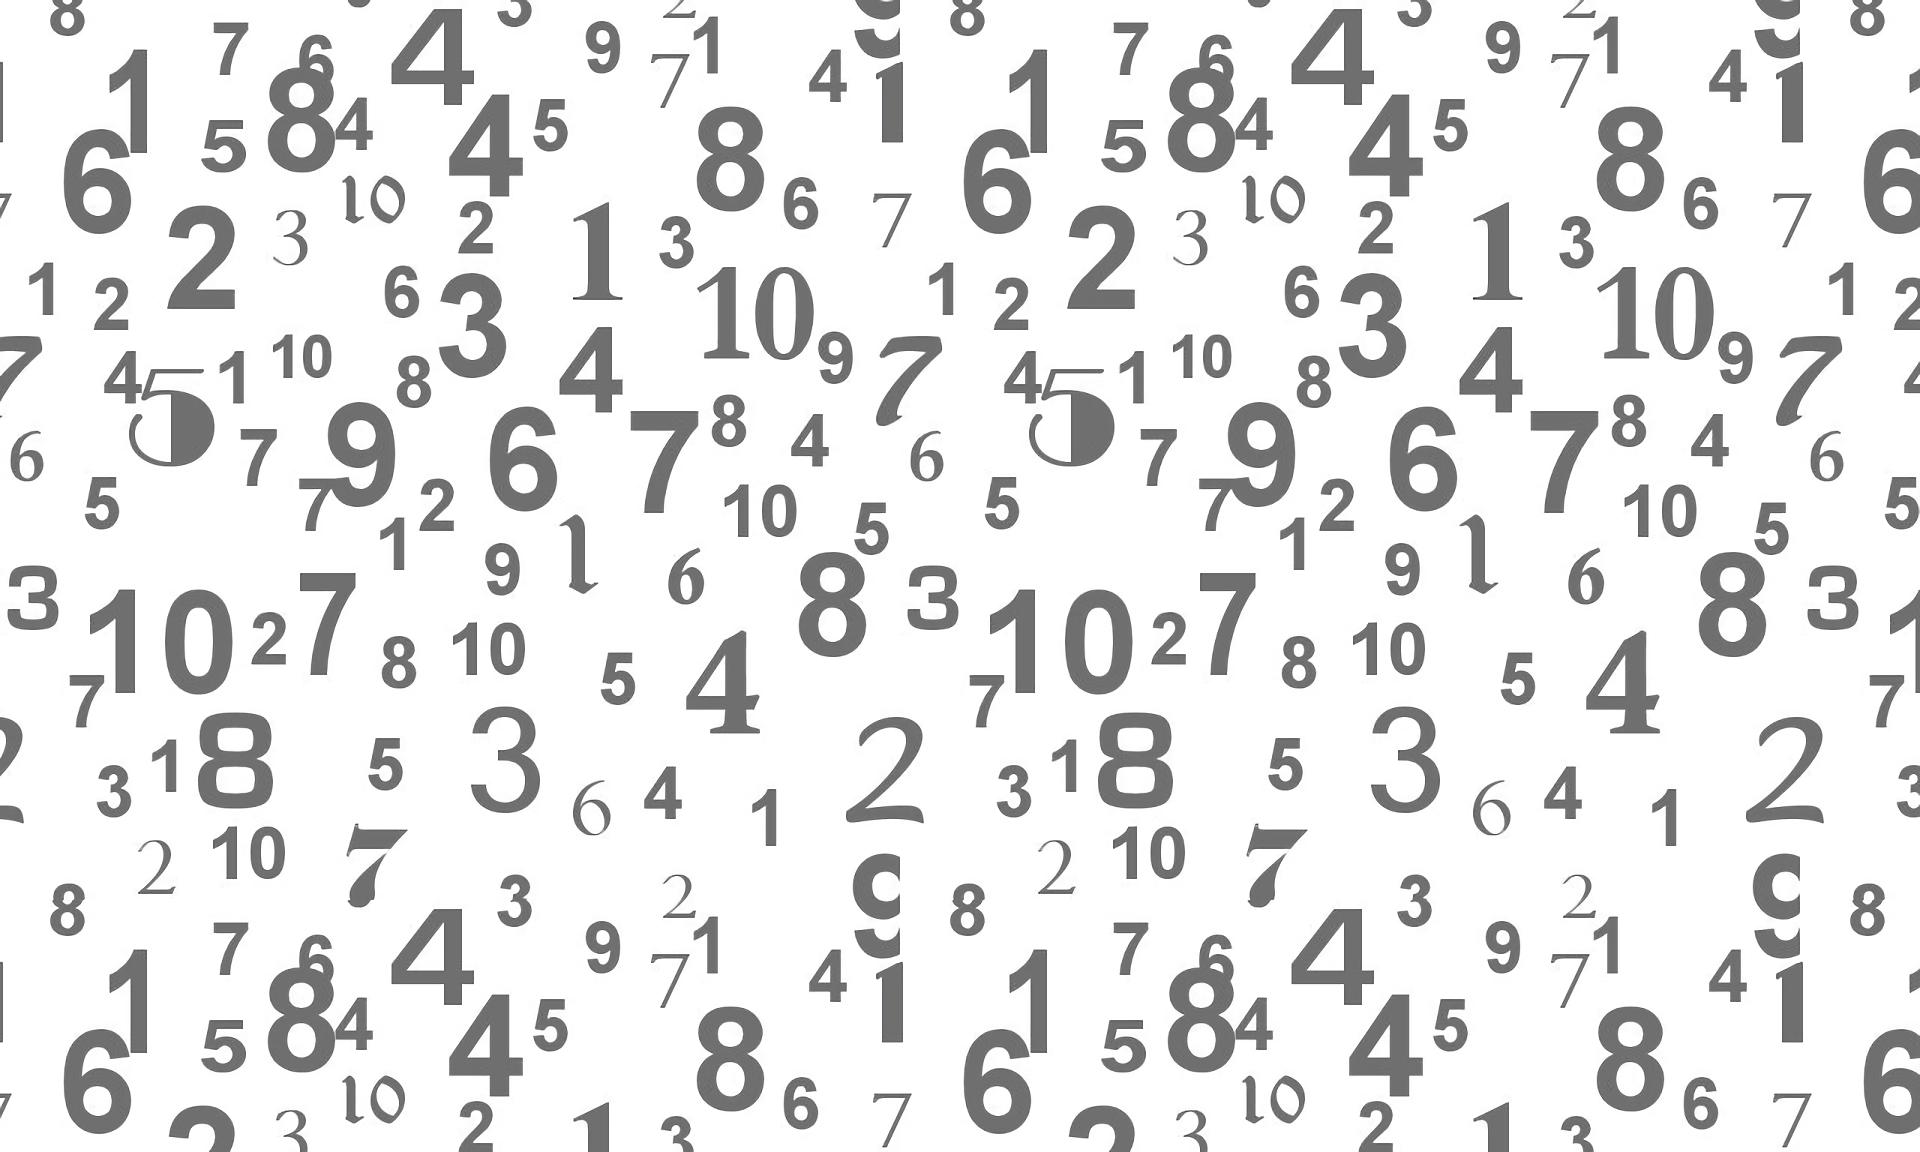 Number Fondo De Pantalla Hd Fondo De Escritorio